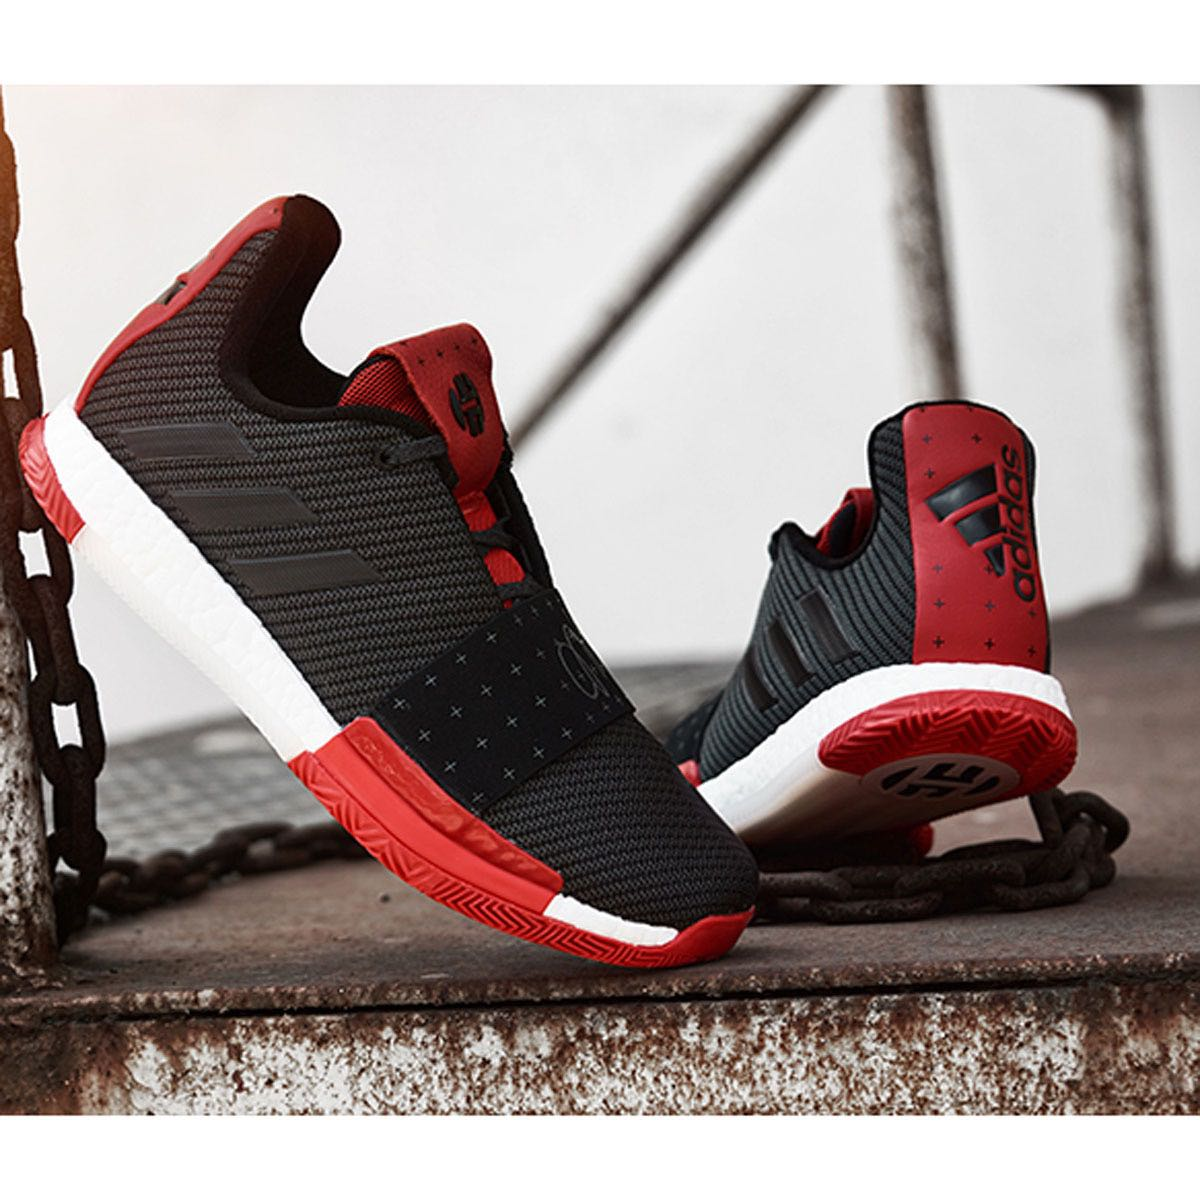 Adidas Harden Vol.3 哈登3代 首发黑白男子实战篮球鞋 G